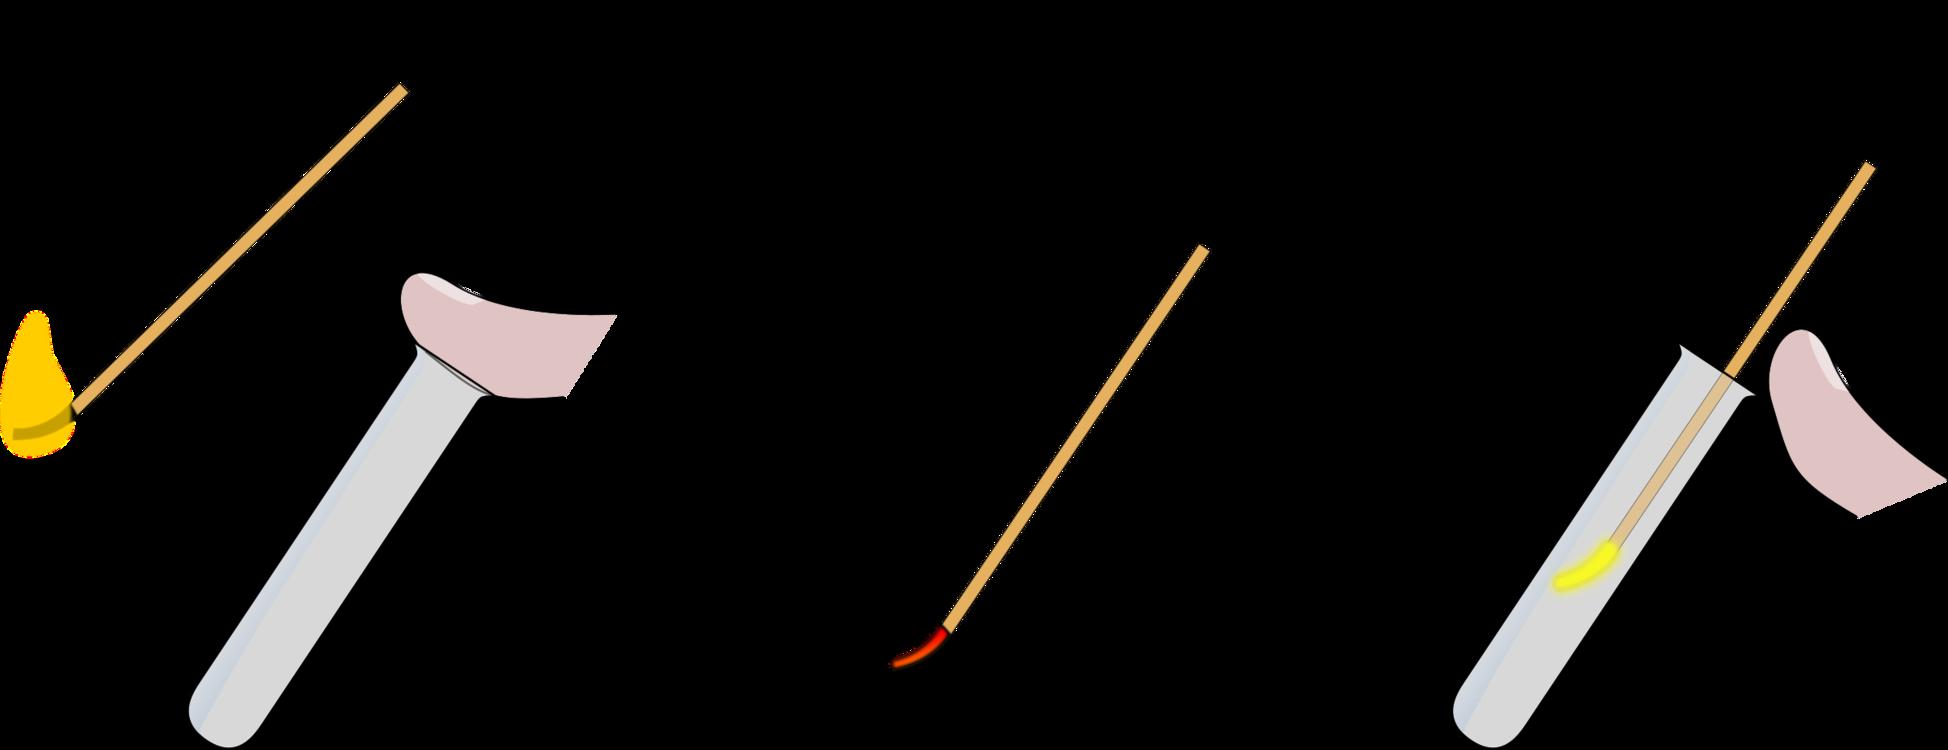 Angle,Wing,Line